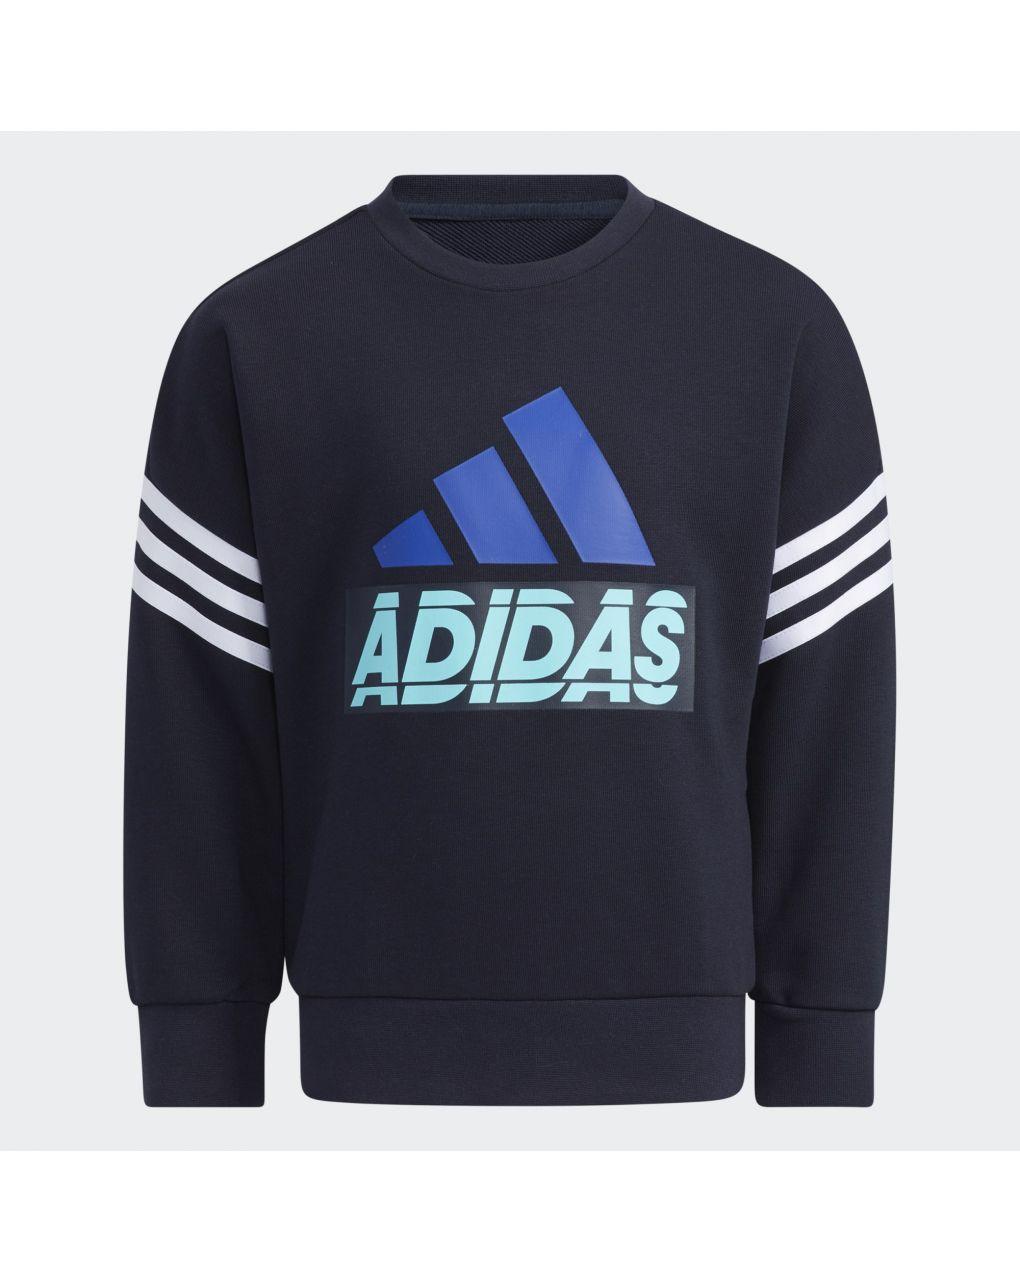 Adidas Μπλούζα Φούτερ Graphic Crewneck Aeroready Μπλε για Αγόρι H40249